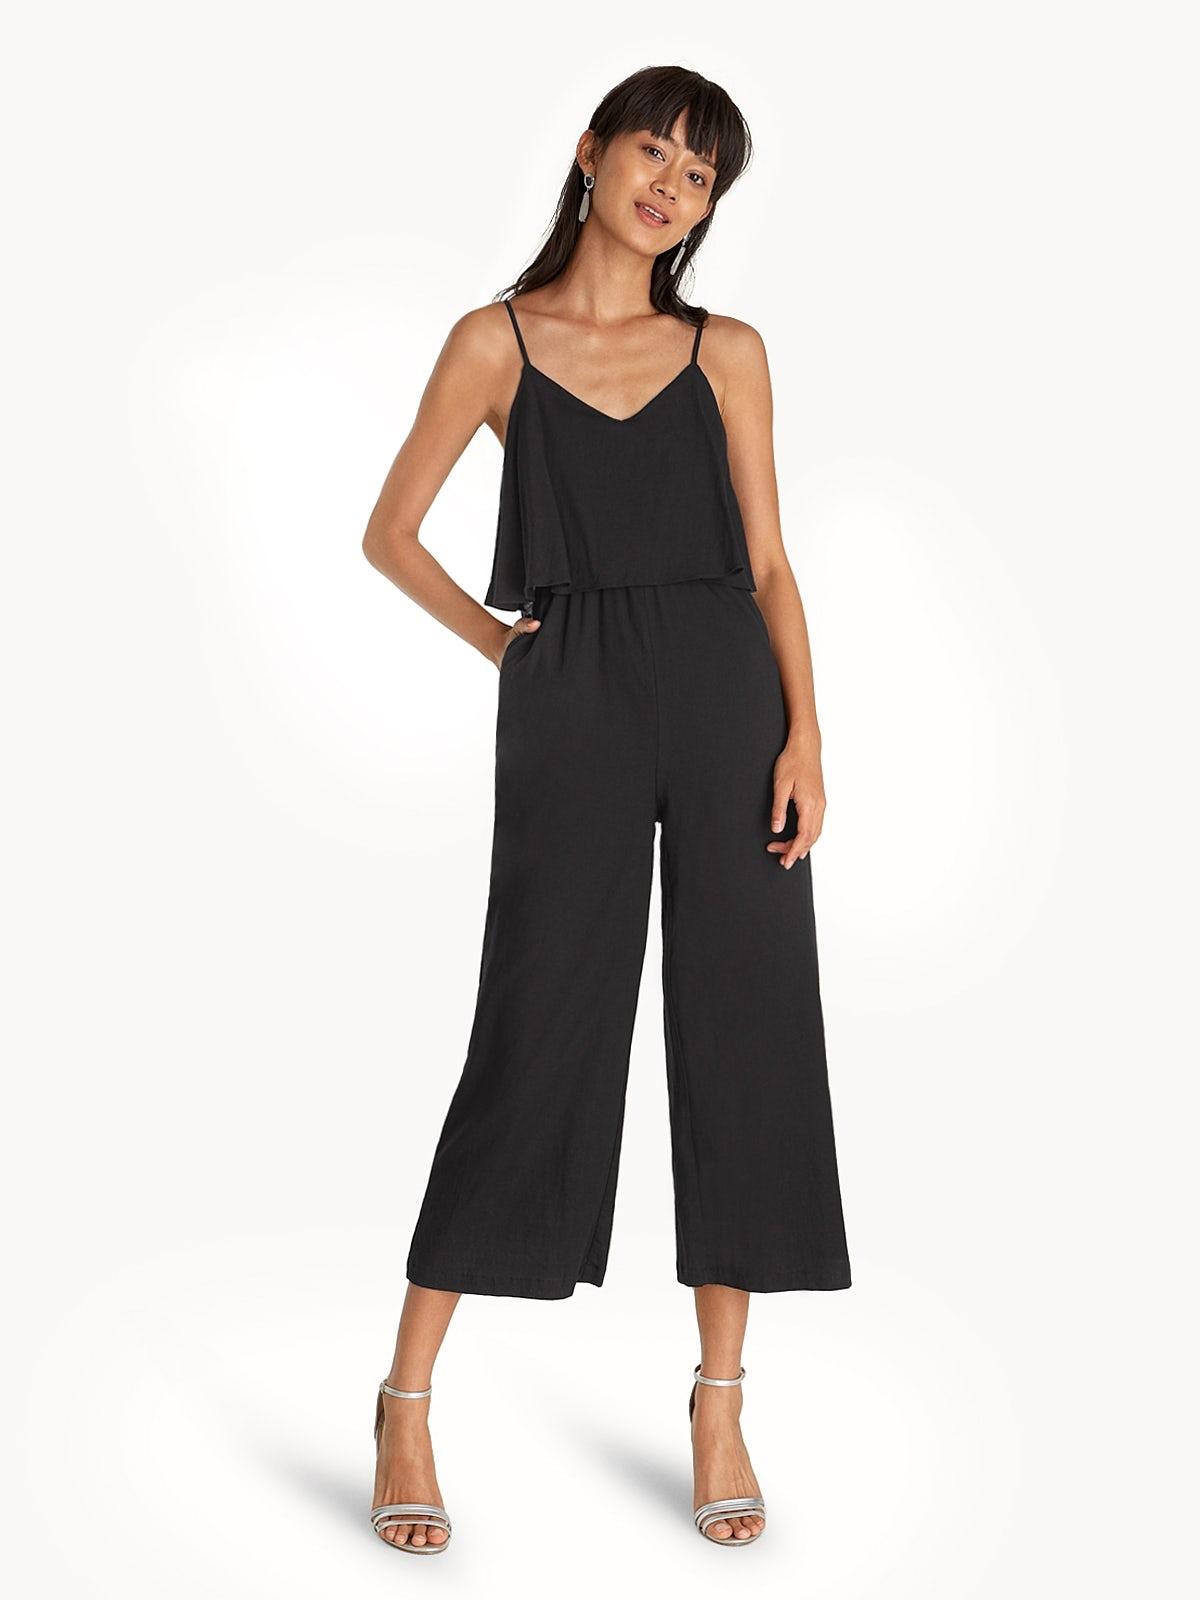 47e4e400ebb8 Relaxed Spaghetti Strap Jumpsuit - Black